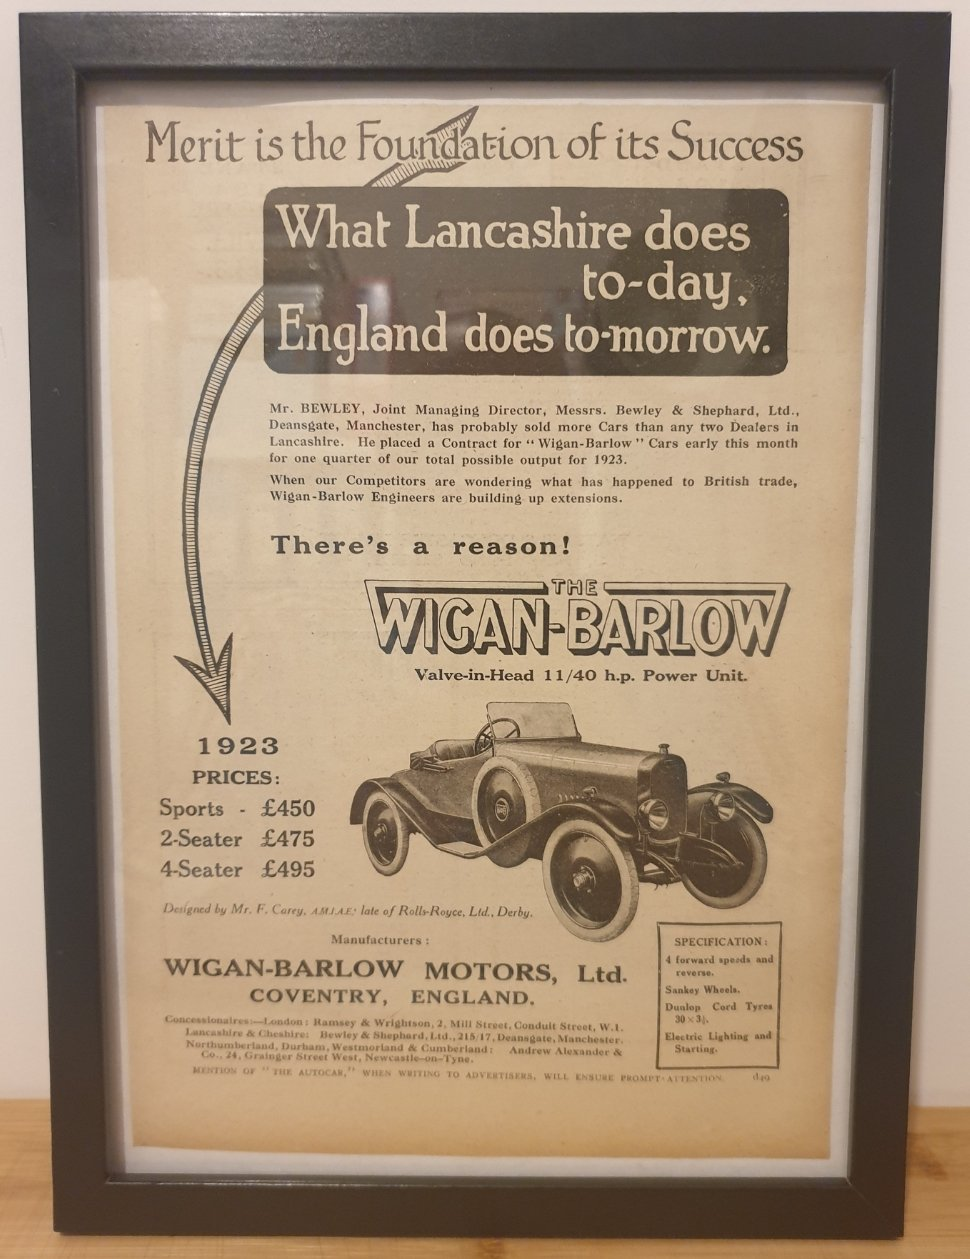 1980 Original 1922 Wigan-Barlow Framed Advert  For Sale (picture 1 of 3)